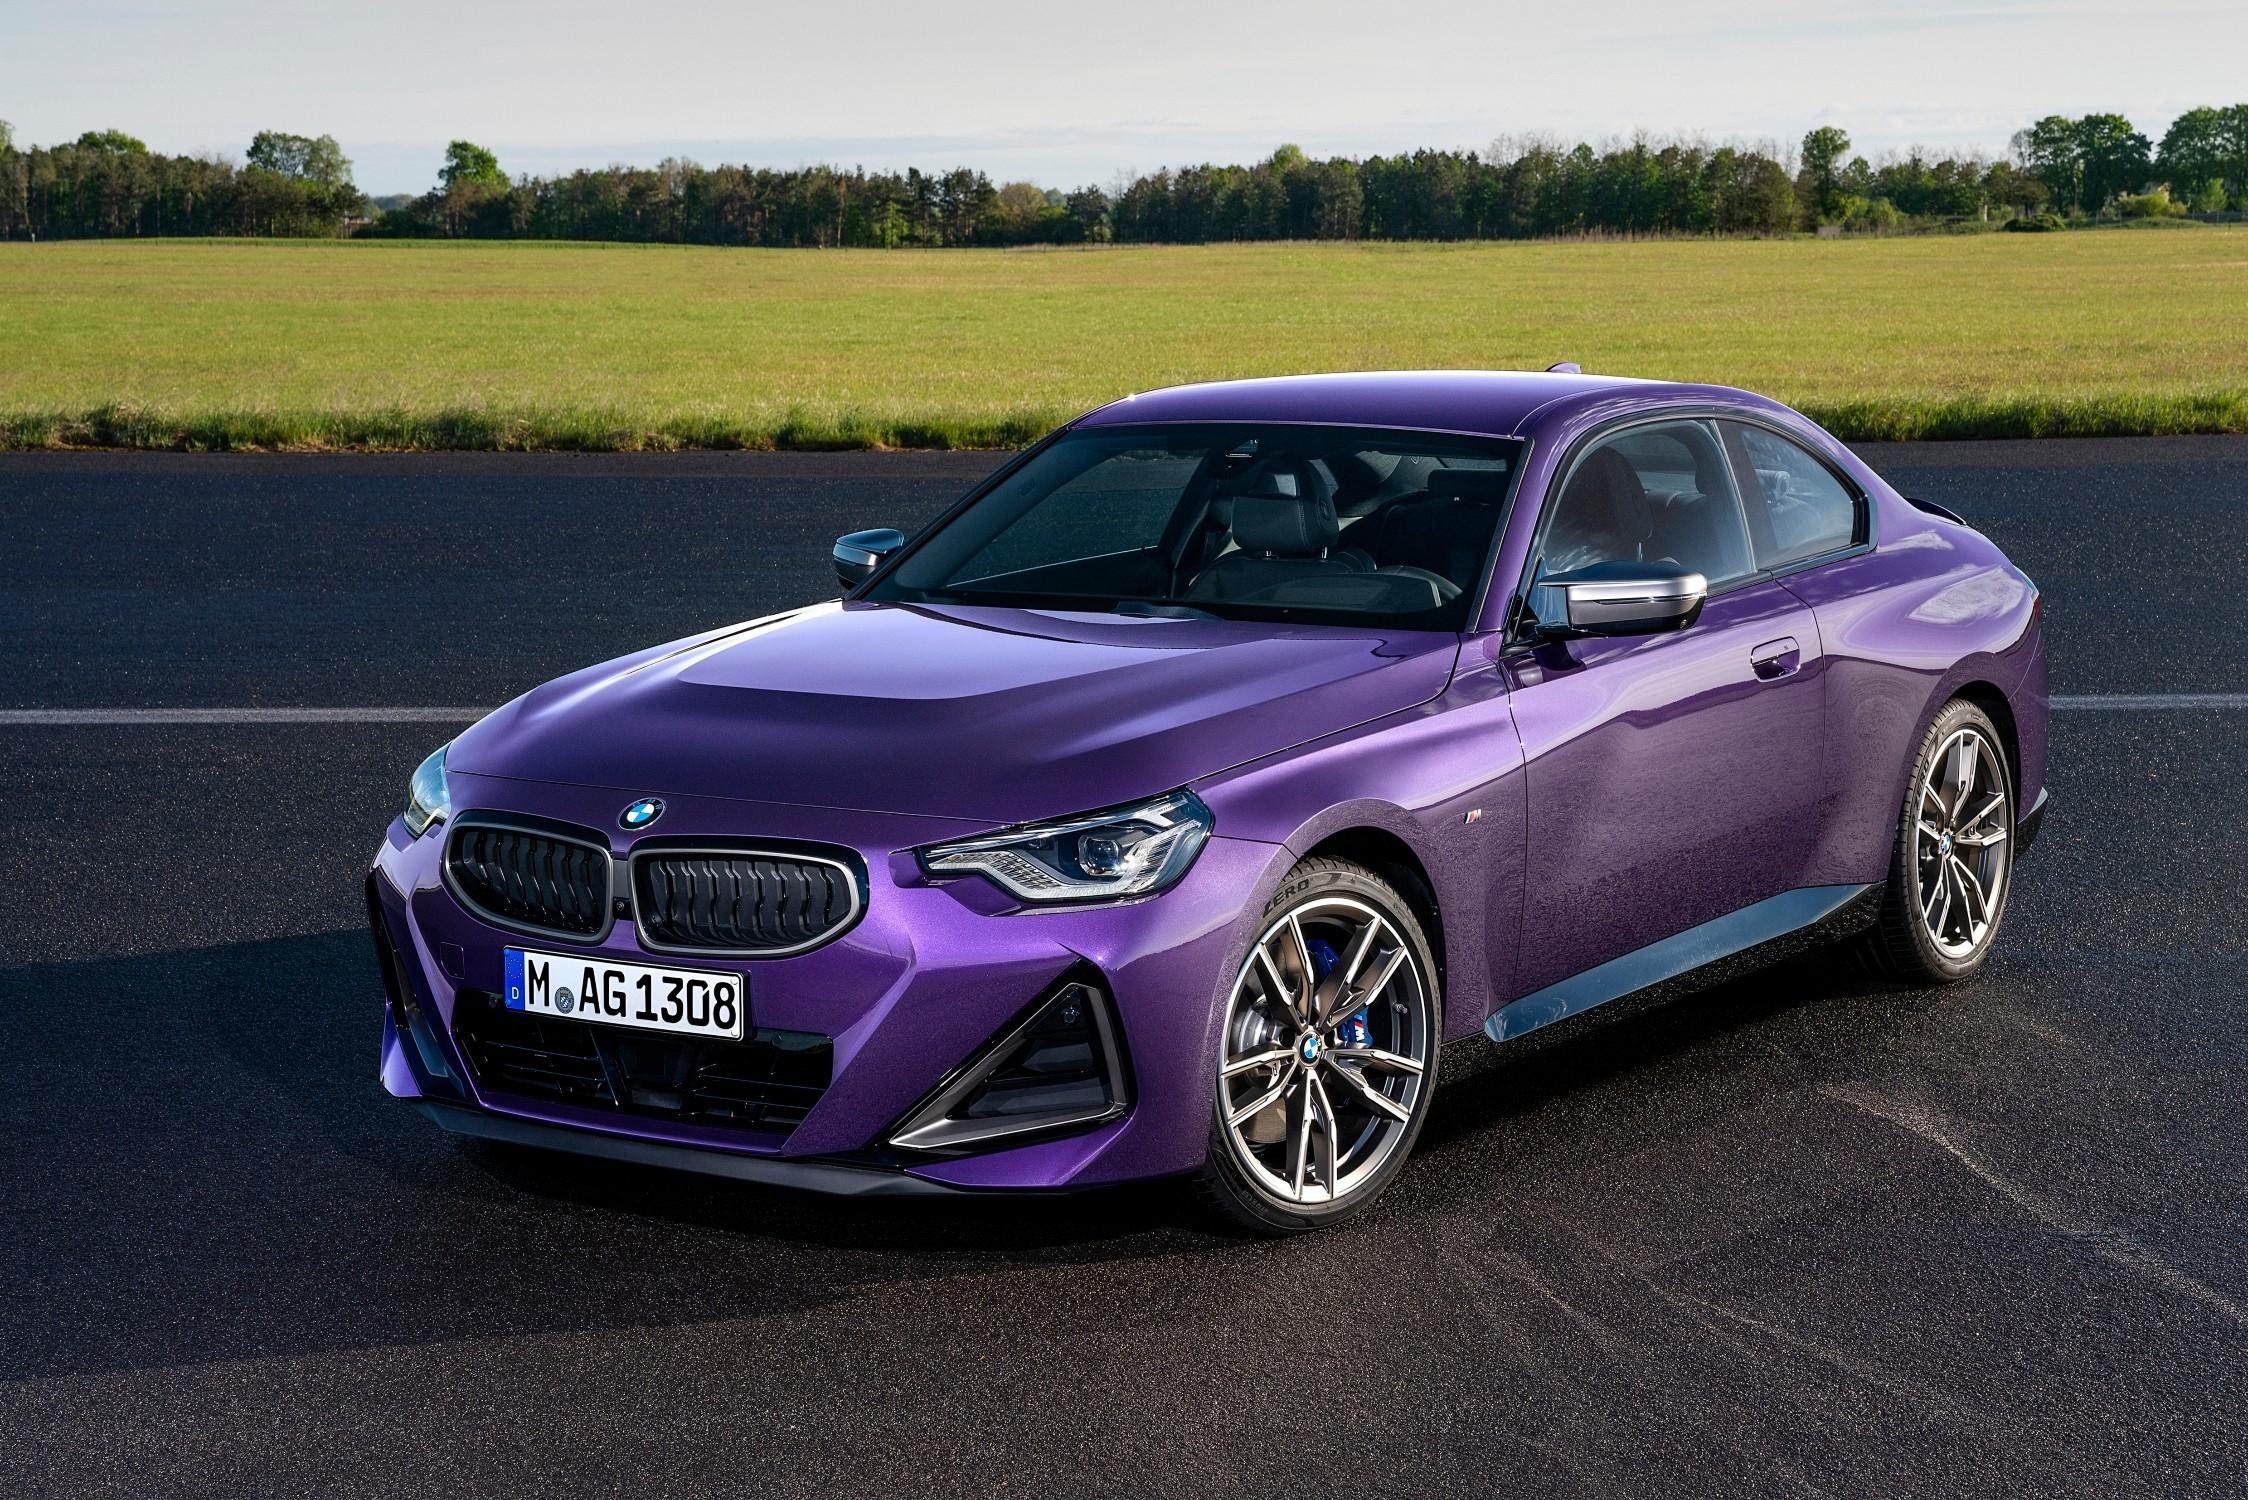 Nuova BMW Serie 2 Coupé: Design, interni e motori.